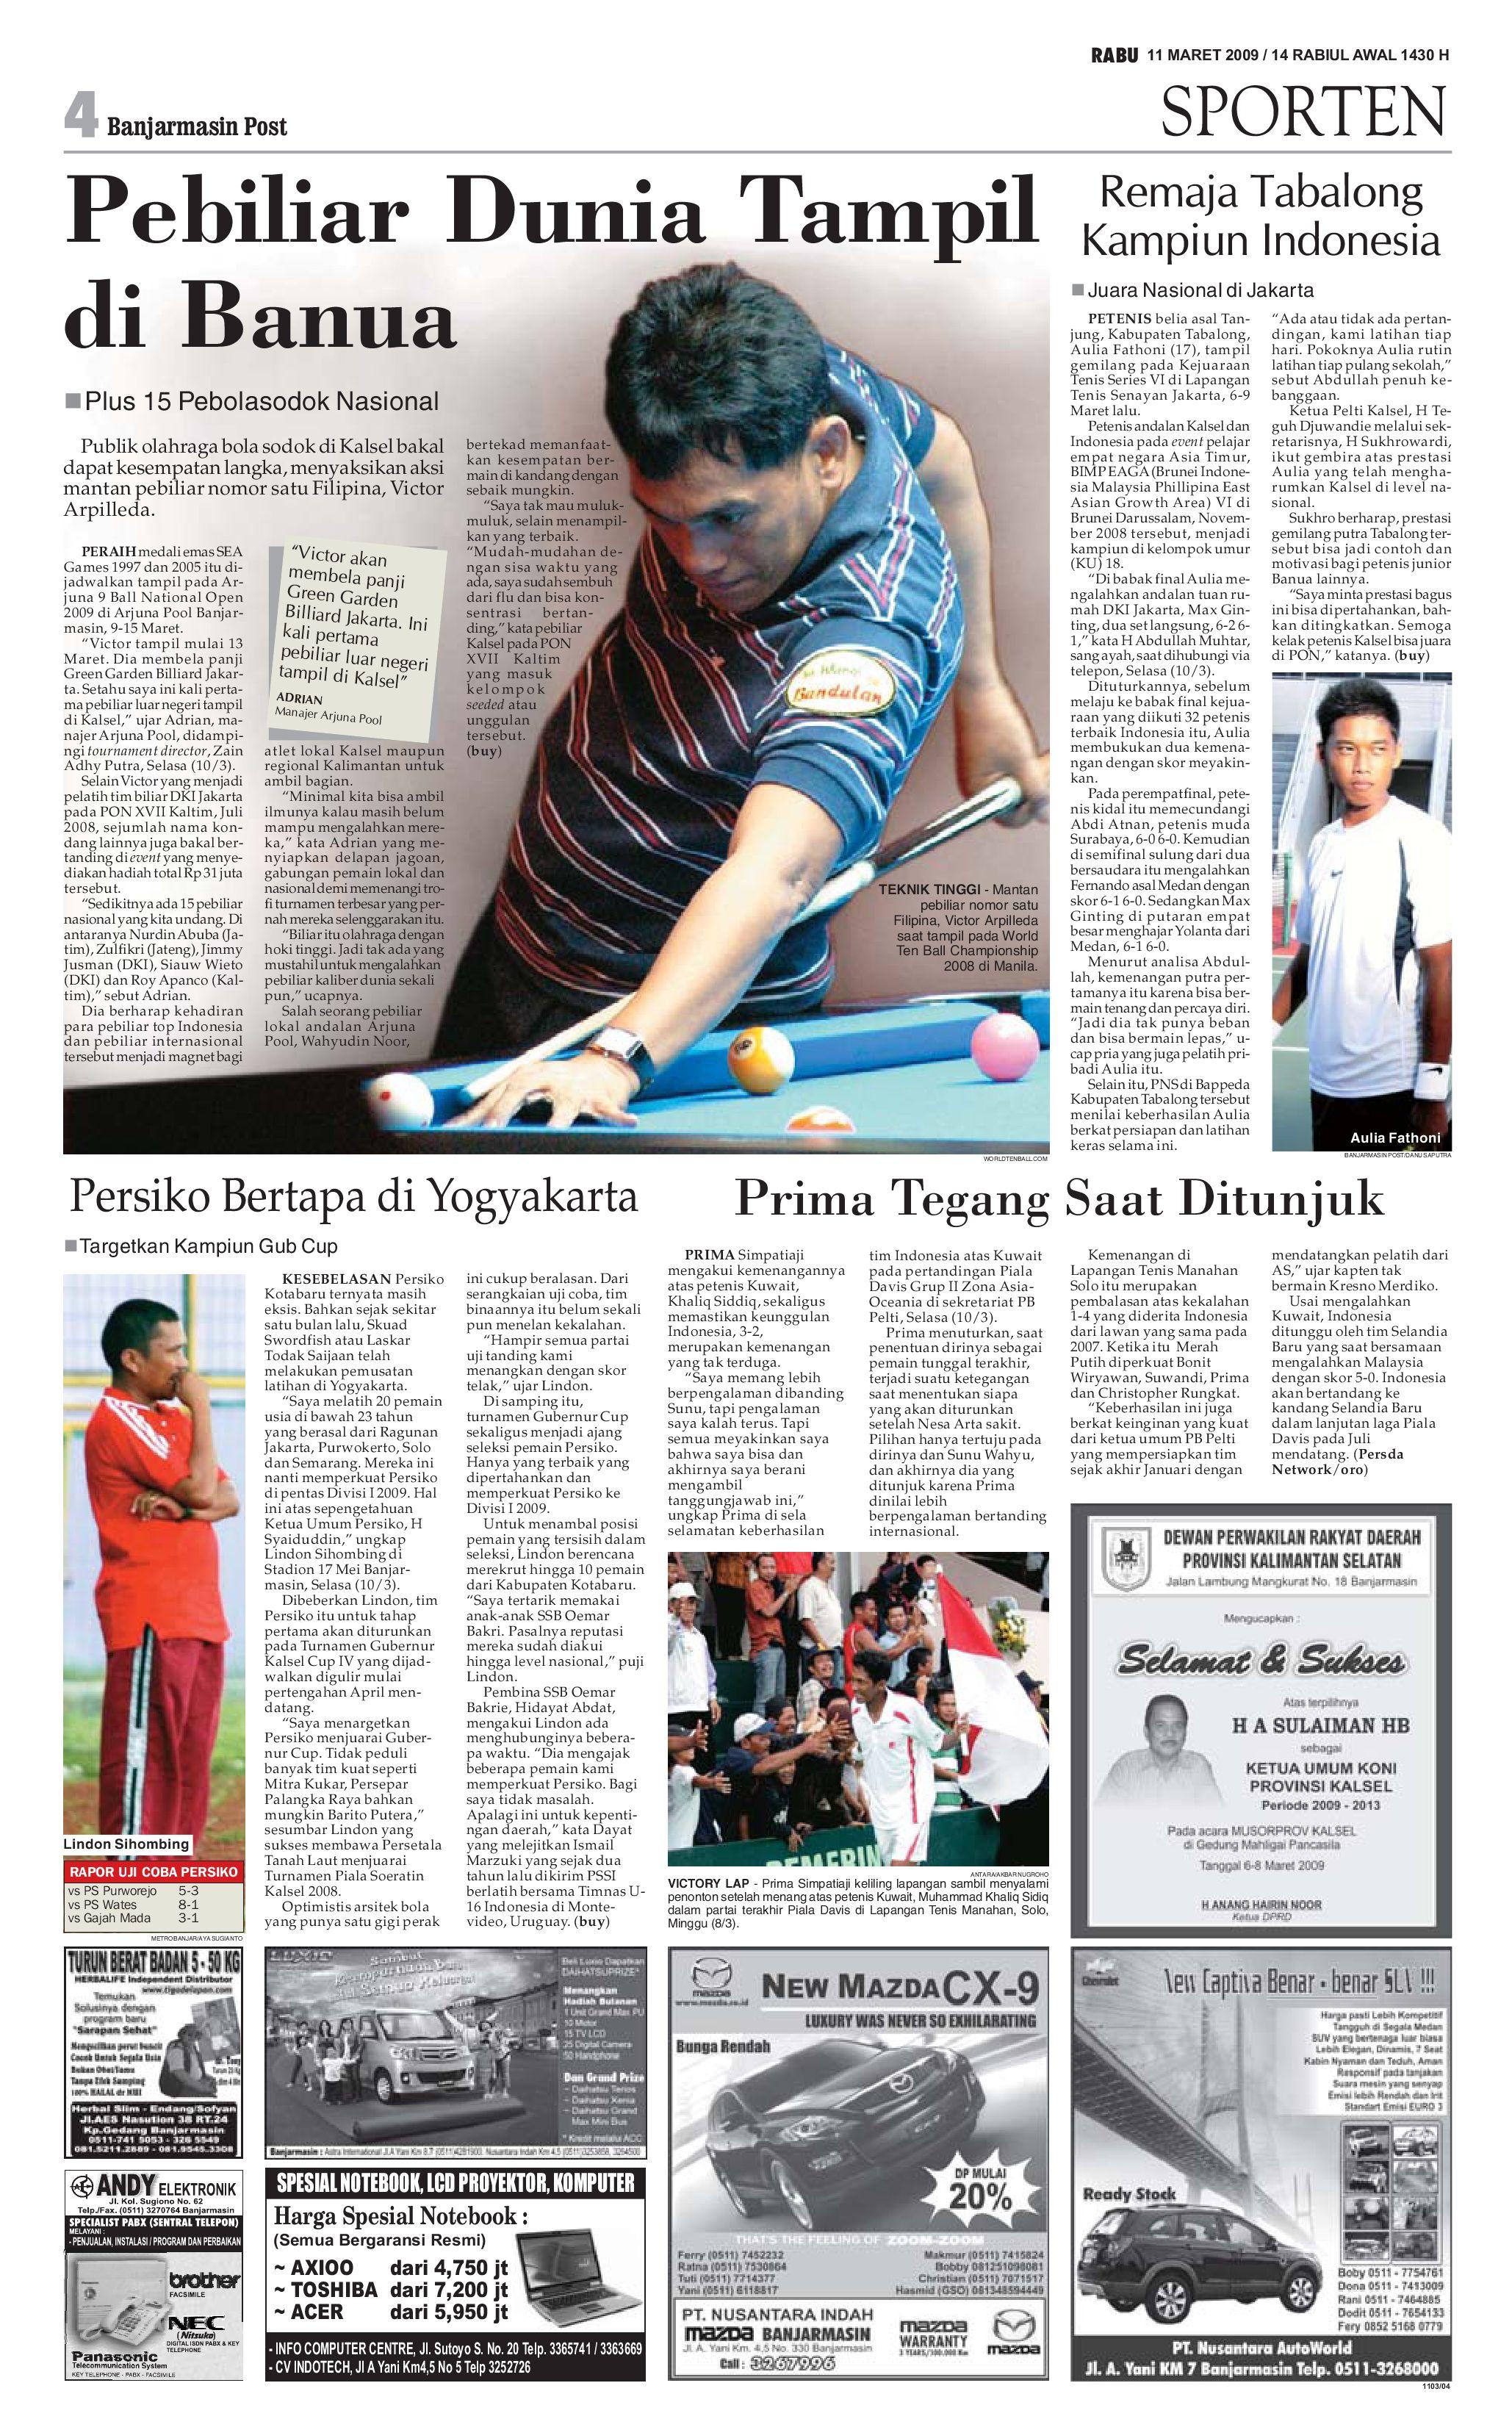 Banjarmasin Post 11 Maret 2009 By Banjarmasin Post Issuu